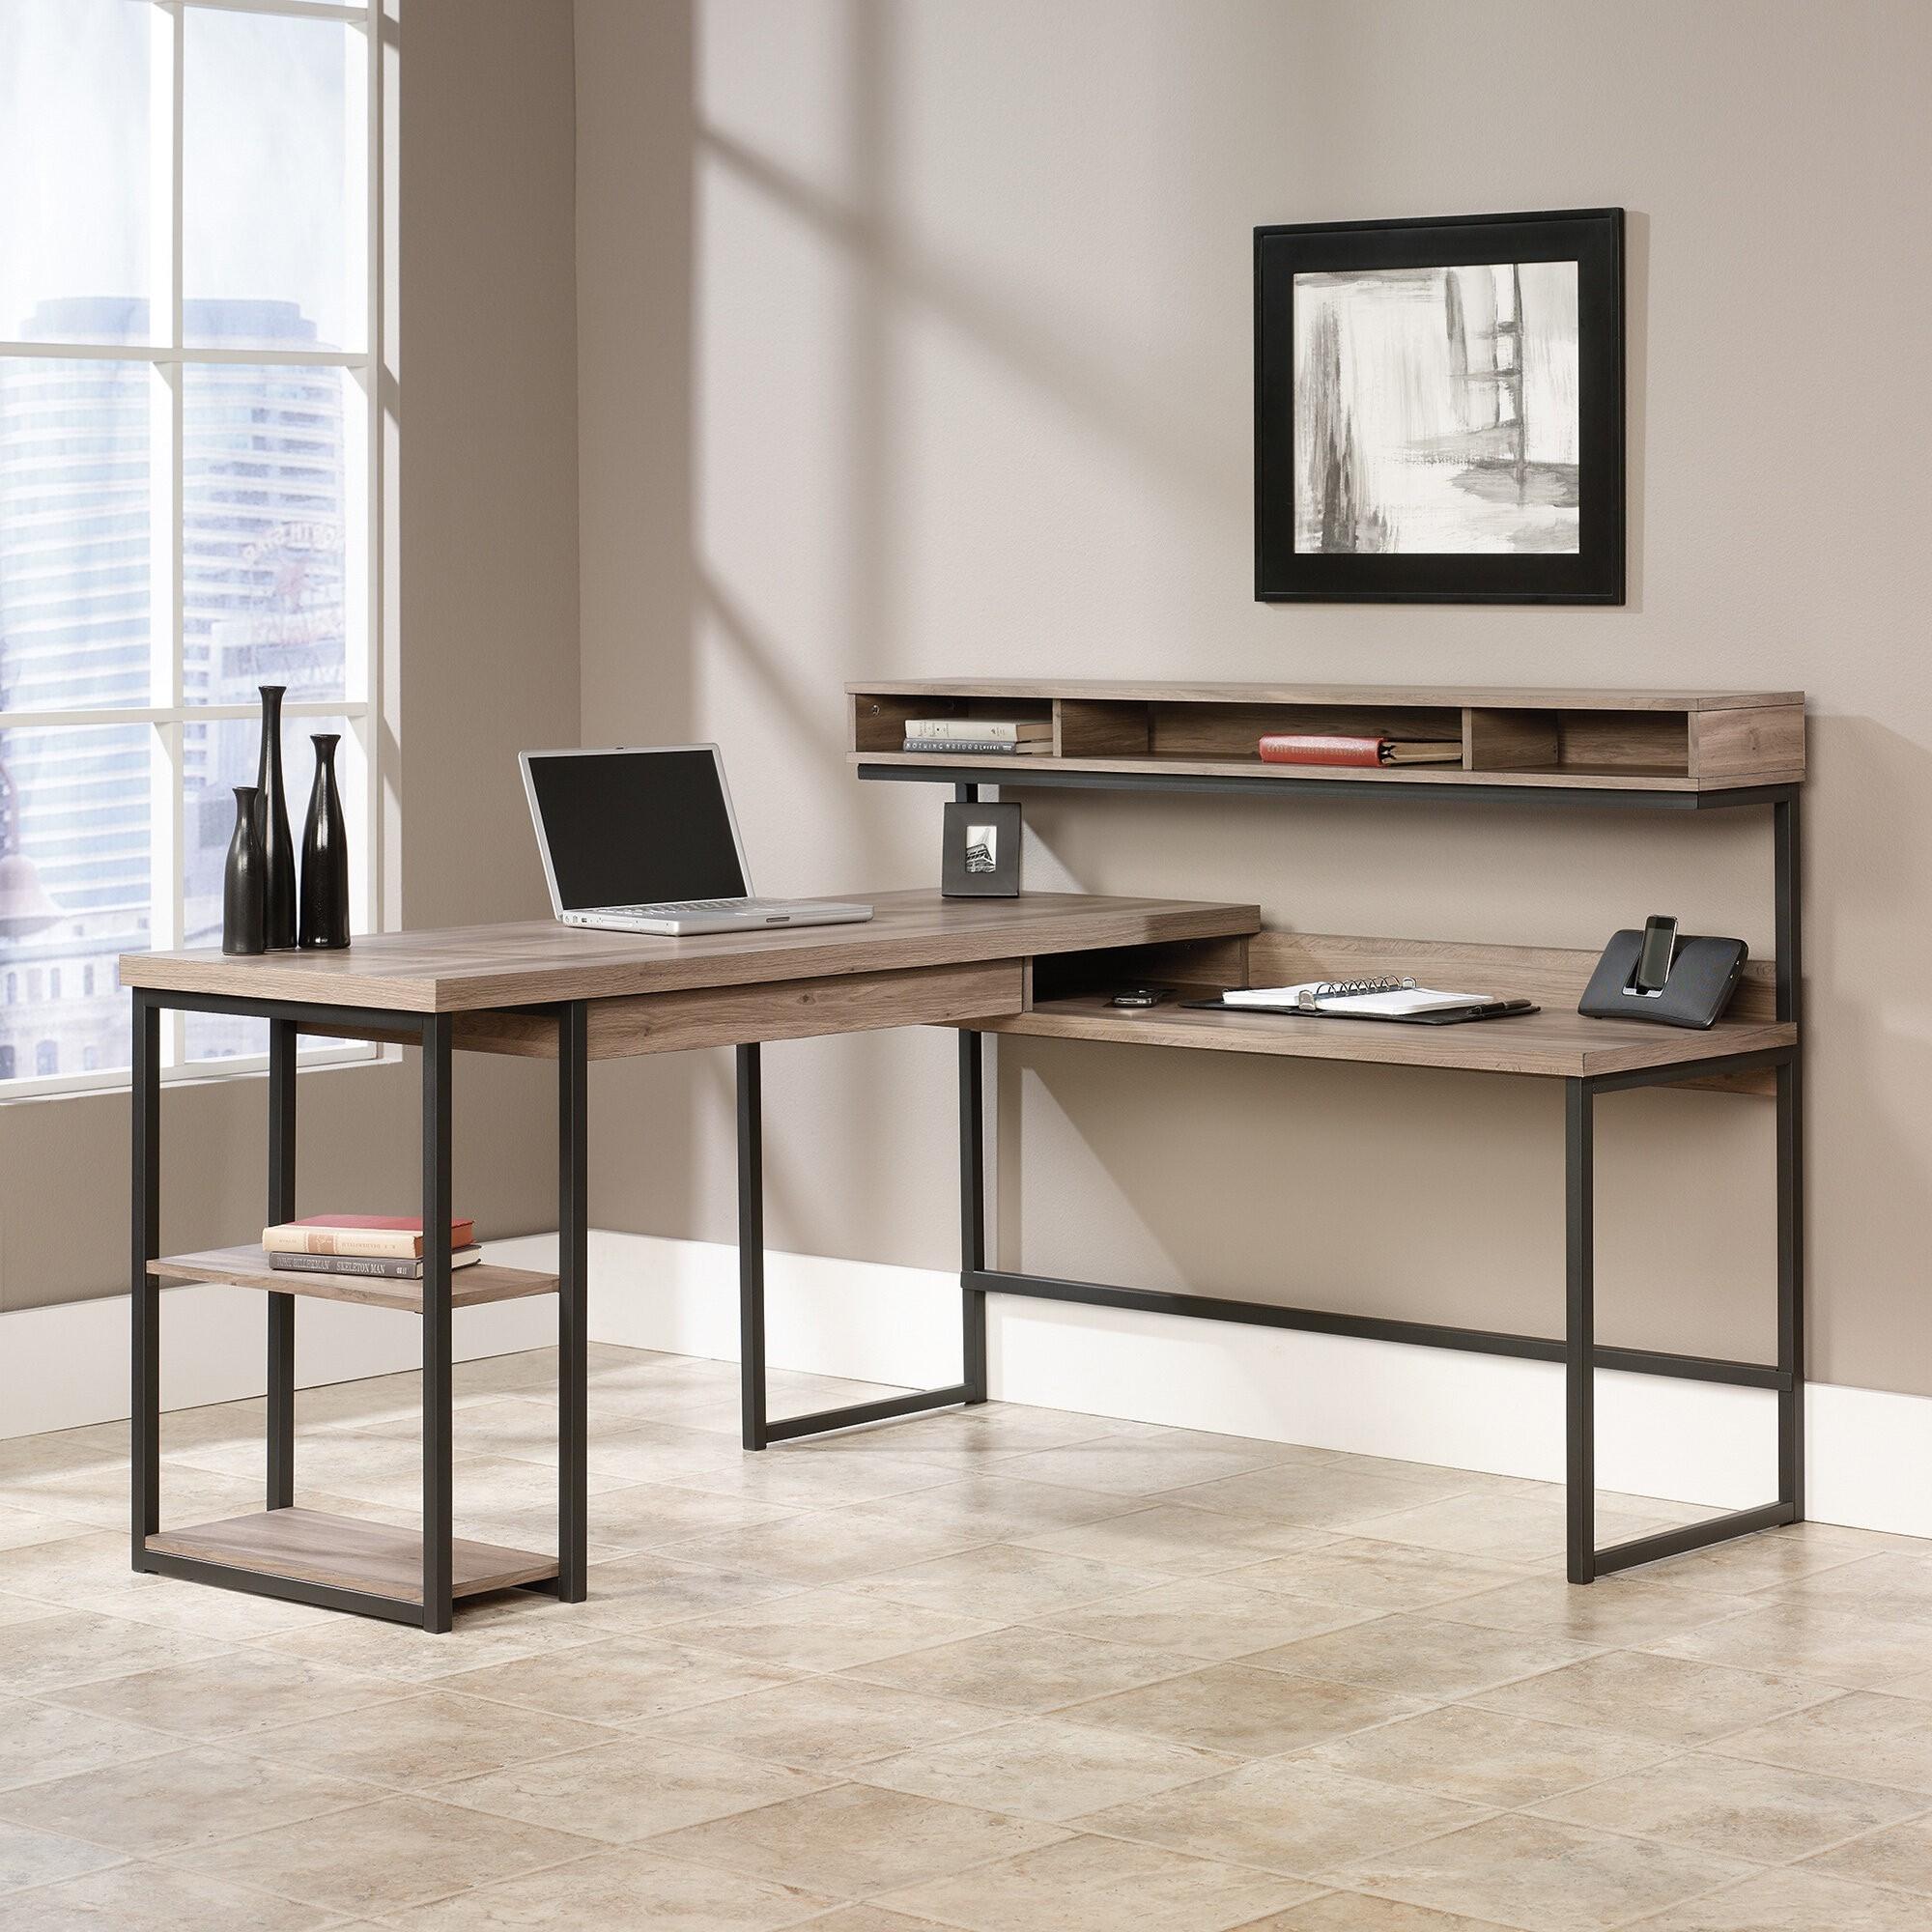 Image of: Modern L Shaped Office Desk Ideas On Foter